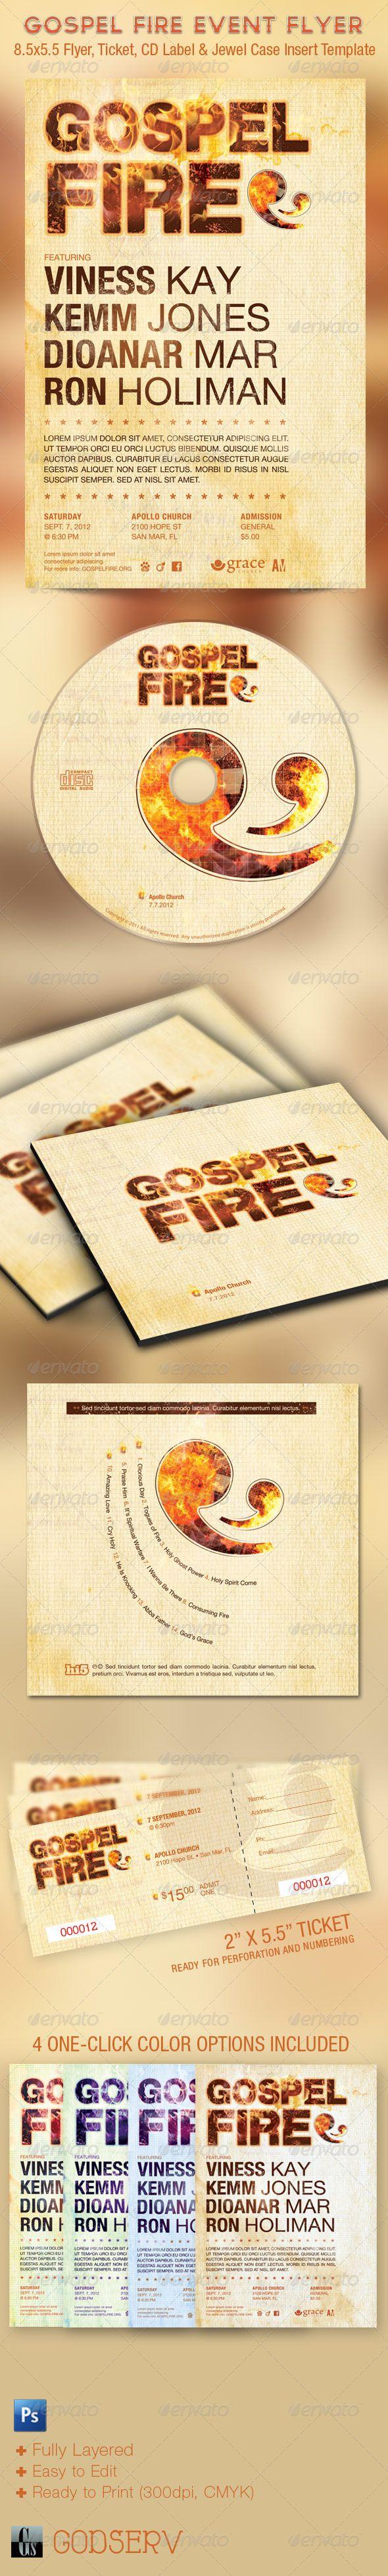 Gospel Fire Church Flyer, Ticket and CD Template